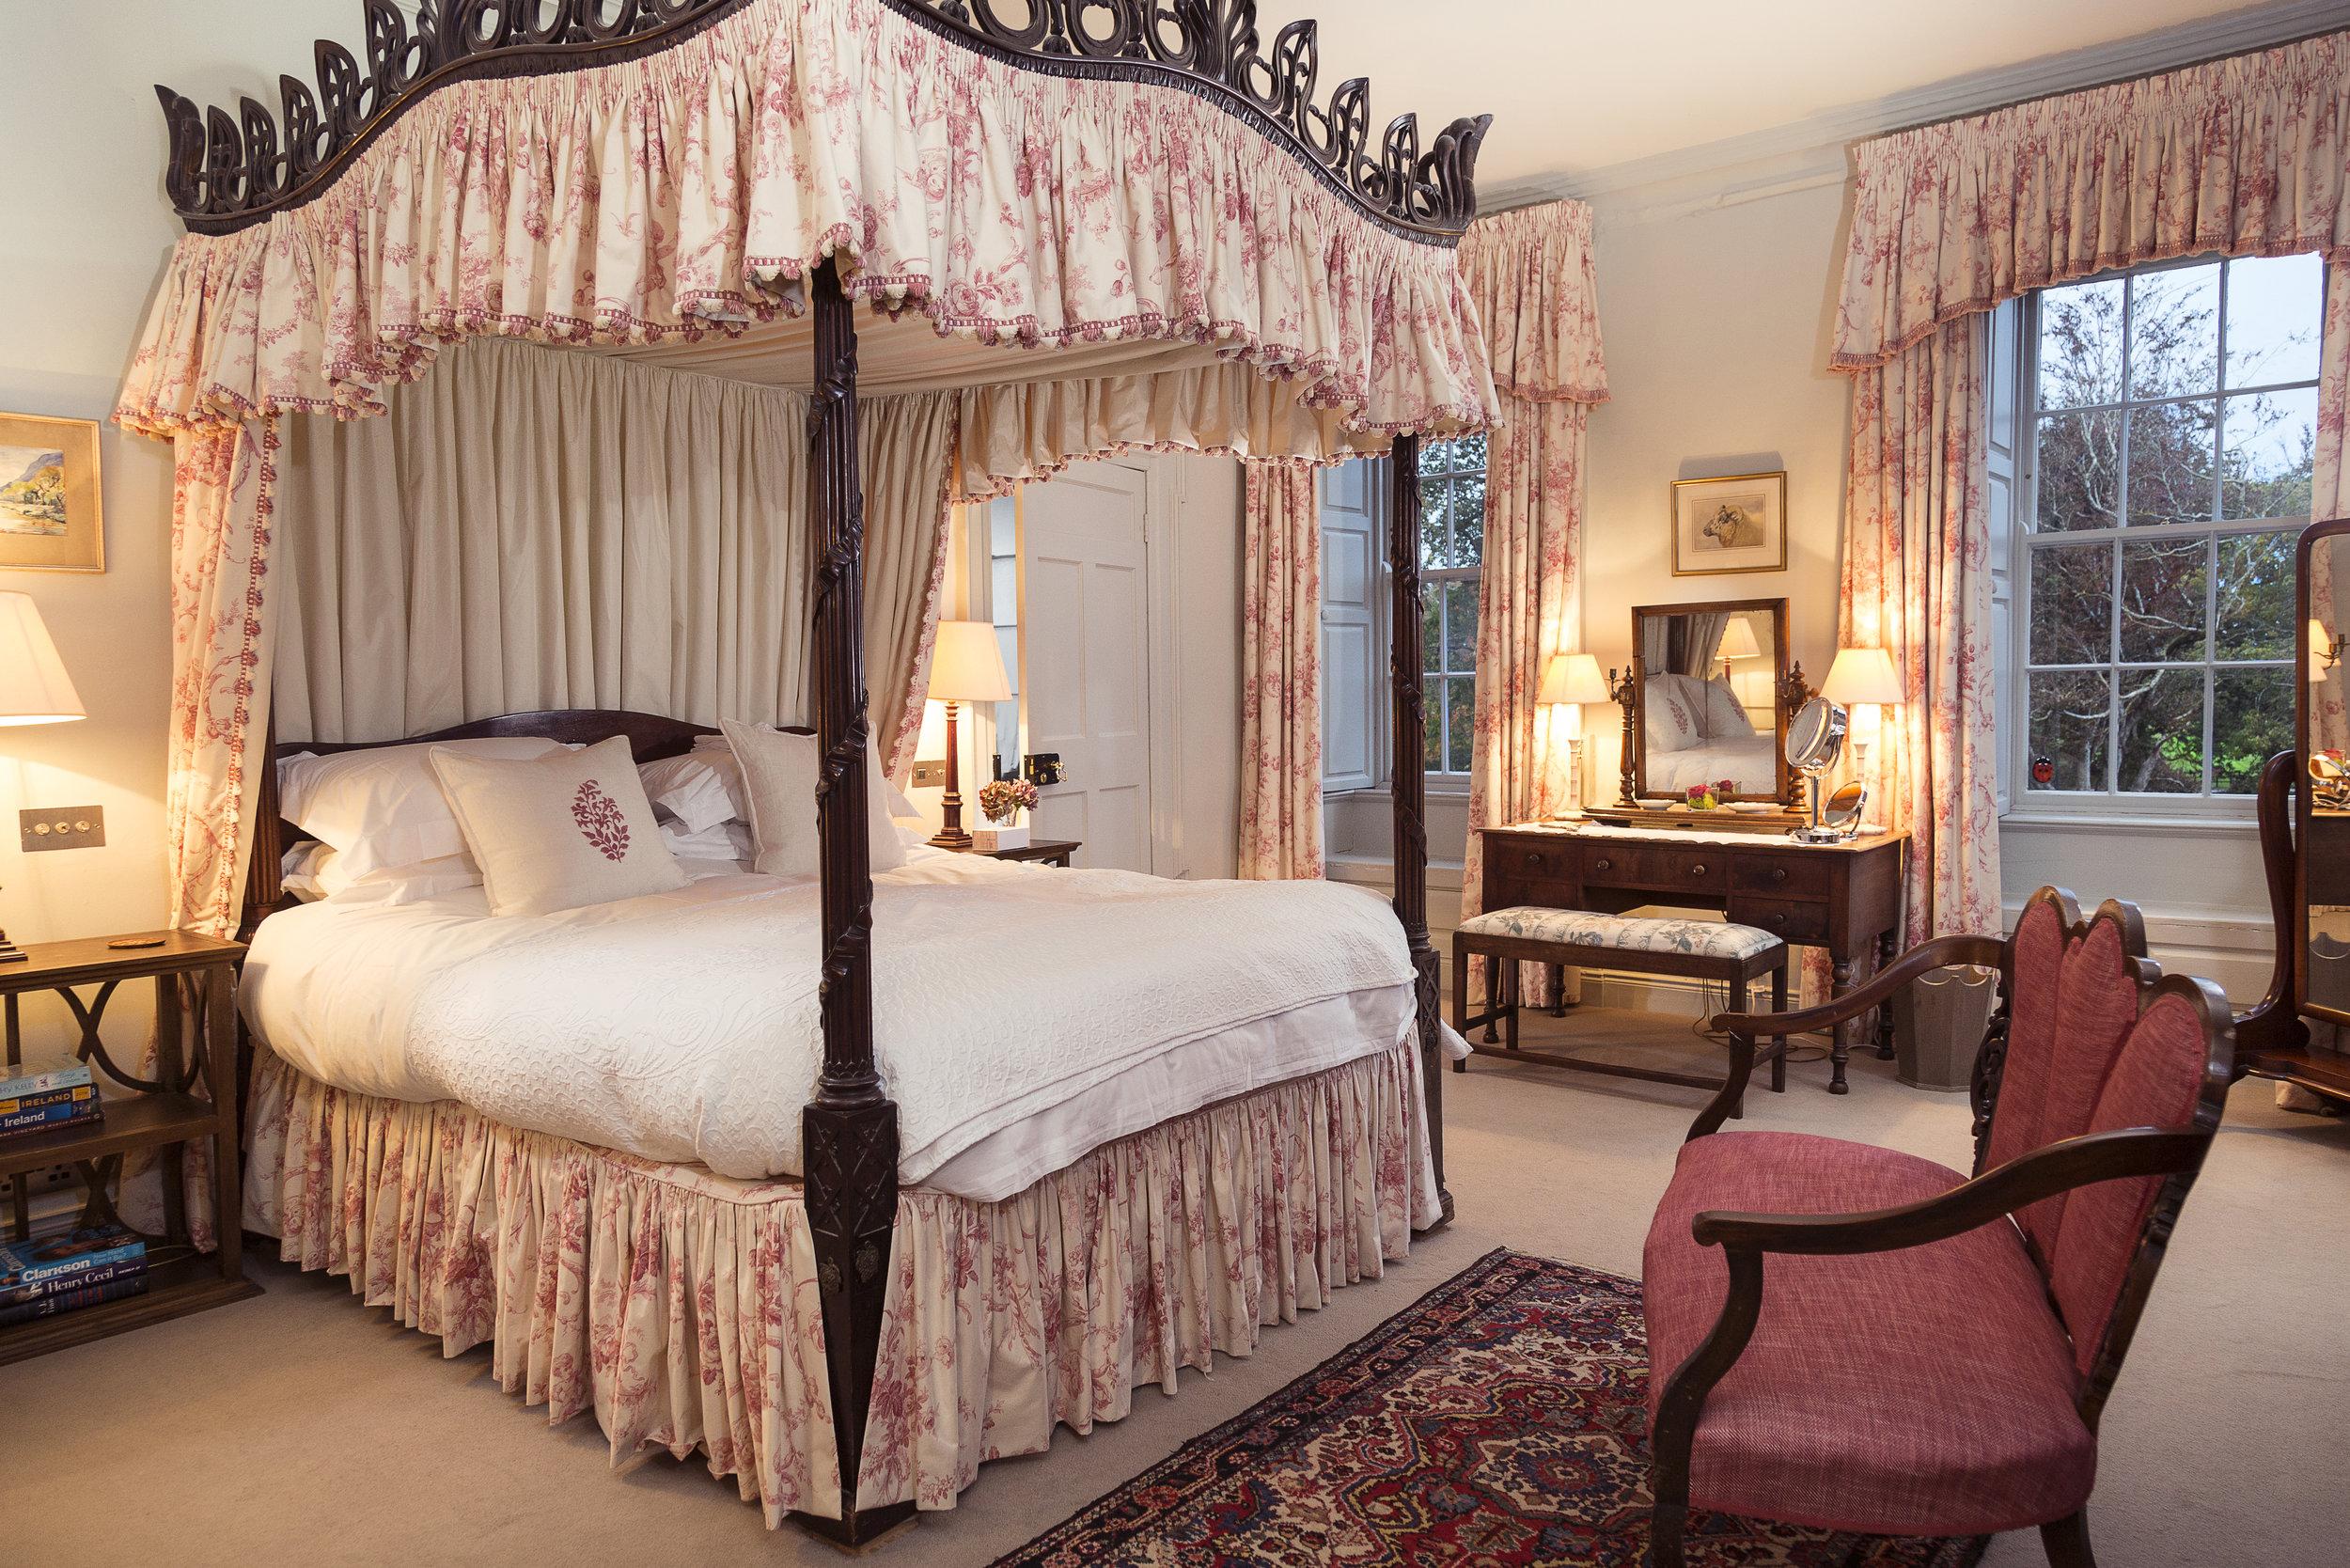 churchtownHouse_bedroom2HIRES.jpg